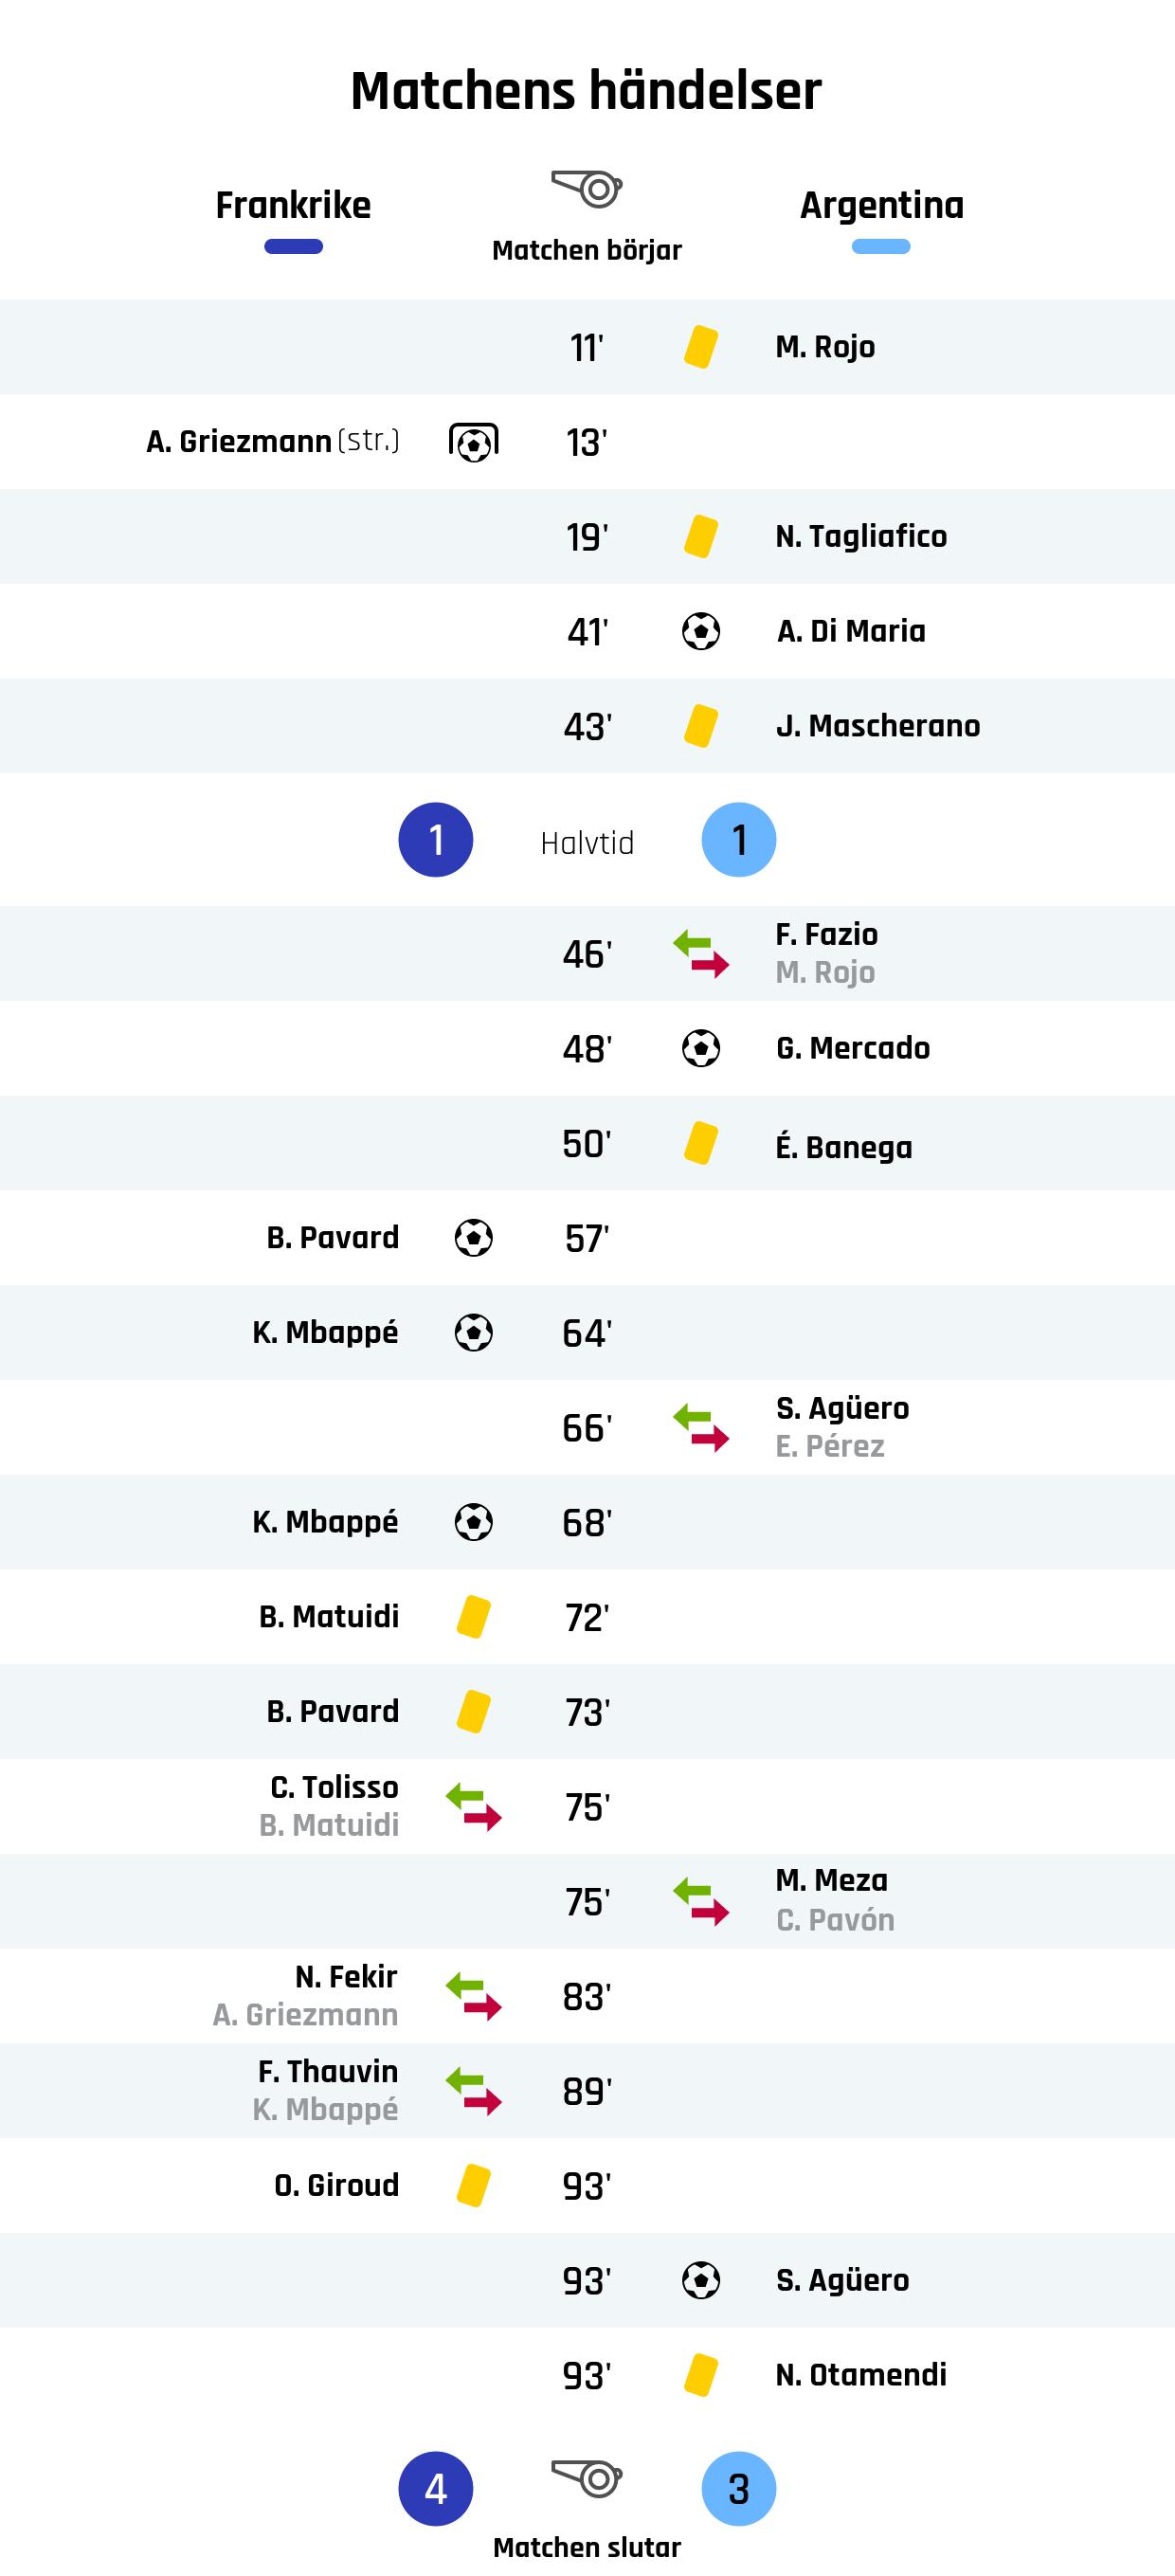 11' Gult kort: M. Rojo, Argentina<br /> 13' Mål på straff Frankrike: A. Griezmann<br /> 19' Gult kort: N. Tagliafico, Argentina<br /> 41' Mål Argentina: A. Di Maria<br /> 43' Gult kort: J. Mascherano, Argentina<br /> Resultat i halvtid: Frankrike 1, Argentina 1<br /> 46' Argentinas byte: F. Fazio in, M. Rojo ut<br /> 48' Mål Argentina: G. Mercado<br /> 50' Gult kort: É. Banega, Argentina<br /> 57' Mål Frankrike: B. Pavard<br /> 64' Mål Frankrike: K. Mbappé<br /> 66' Argentinas byte: S. Agüero in, E. Pérez ut<br /> 68' Mål Frankrike: K. Mbappé<br /> 72' Gult kort: B. Matuidi, Frankrike<br /> 73' Gult kort: B. Pavard, Frankrike<br /> 75' Frankrikes byte: C. Tolisso in, B. Matuidi ut<br /> 75' Argentinas byte: M. Meza in, C. Pavón ut<br /> 83' Frankrikes byte: N. Fekir in, A. Griezmann ut<br /> 89' Frankrikes byte: F. Thauvin in, K. Mbappé ut<br /> 93' Gult kort: O. Giroud, Frankrike<br /> 93' Mål Argentina: S. Agüero<br /> 93' Gult kort: N. Otamendi, Argentina<br /> Slutresultat: Frankrike 4, Argentina 3